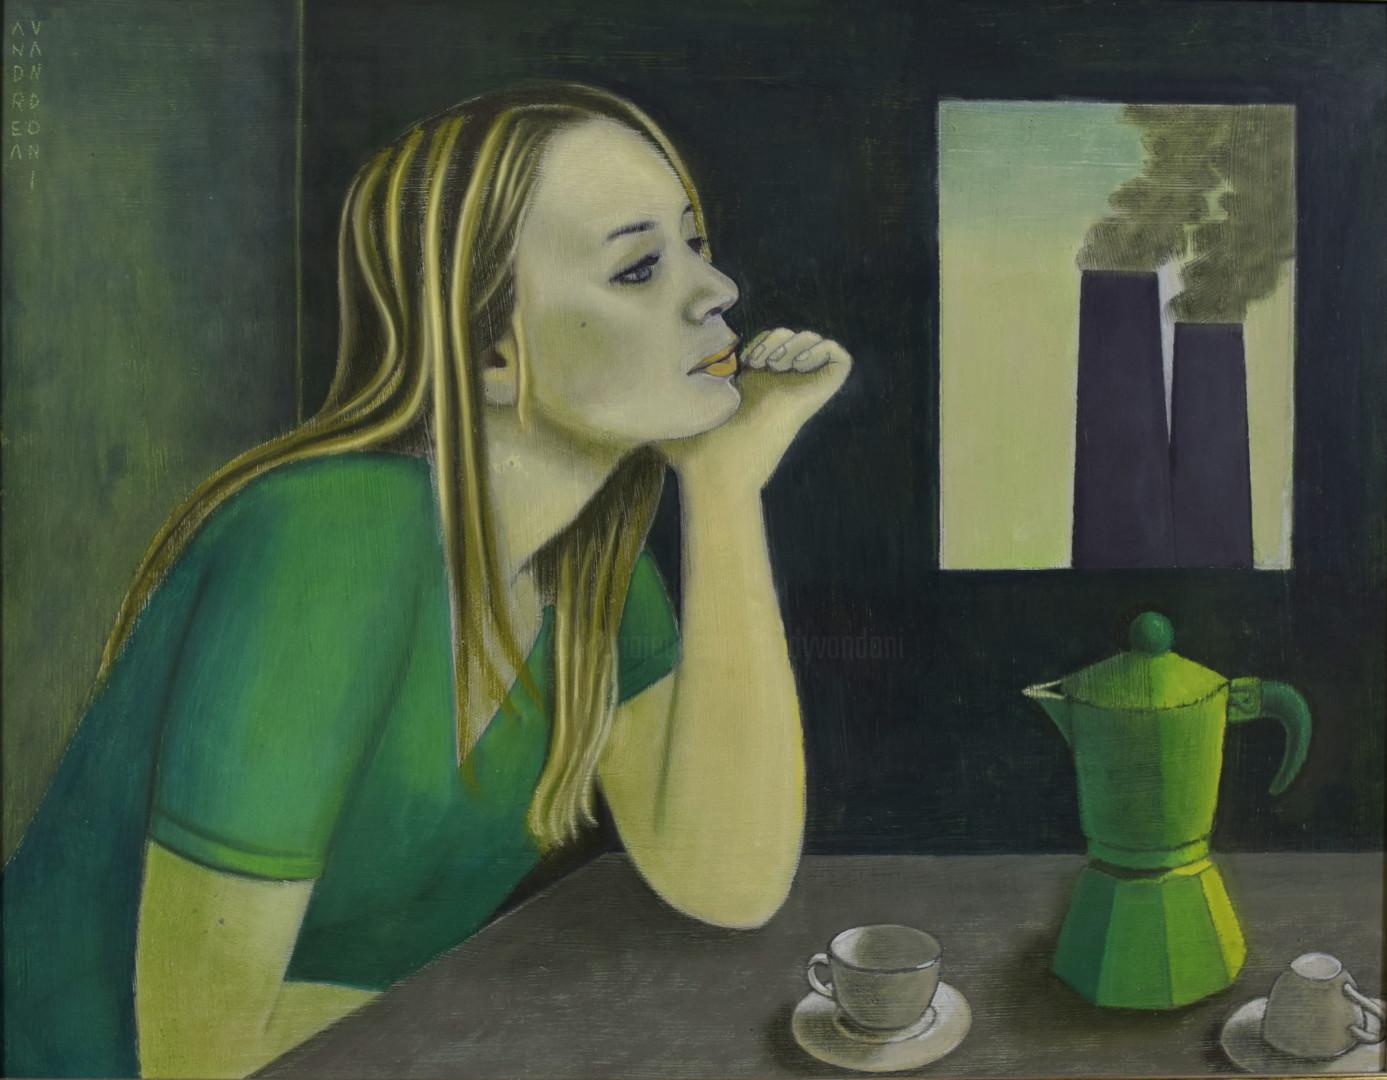 Andrea Vandoni - AT SUNSET